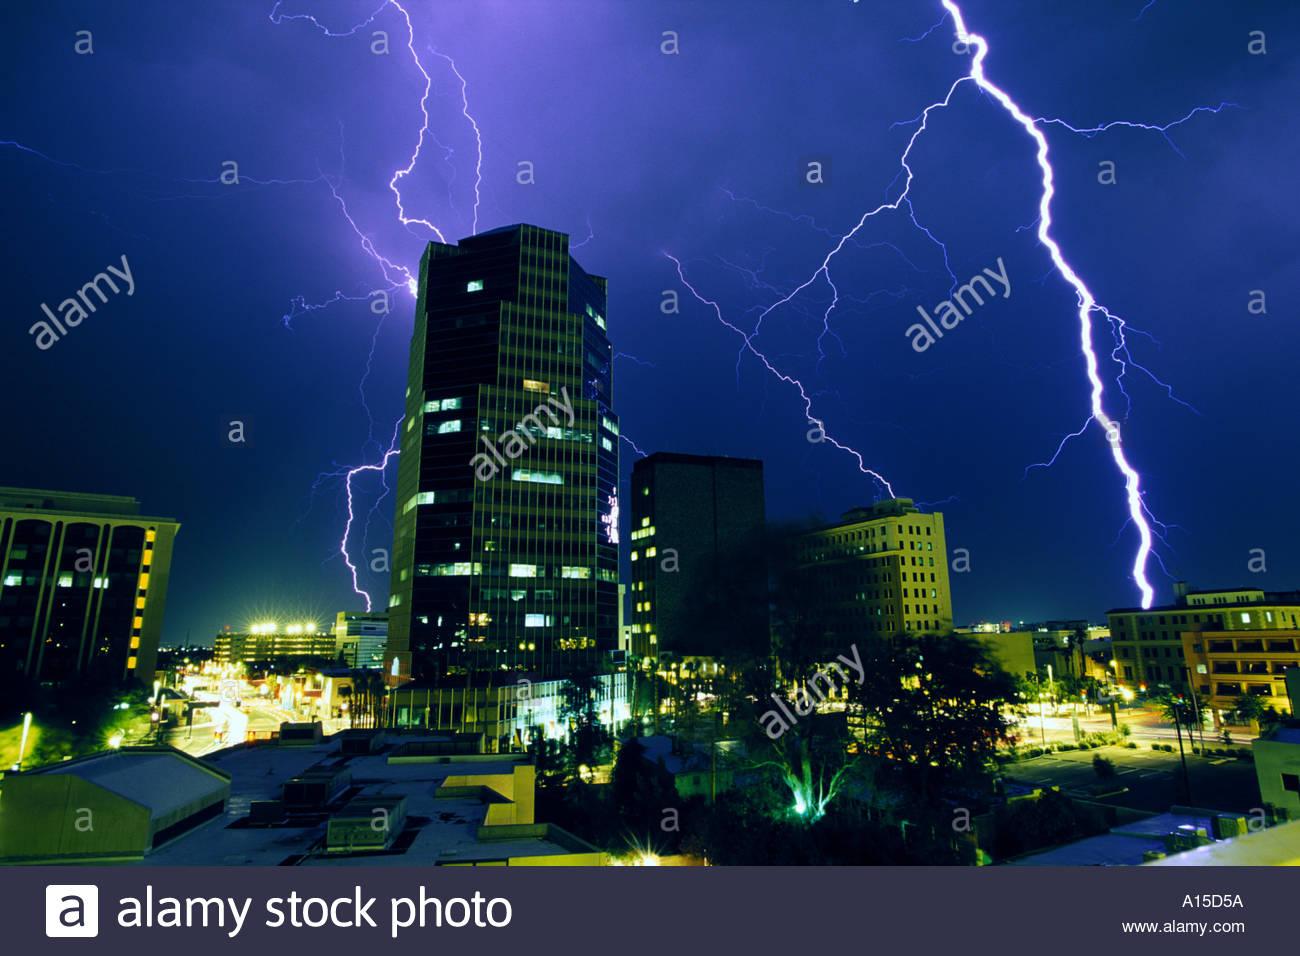 lightning over city at night downtown tucson arizona tucson skyline